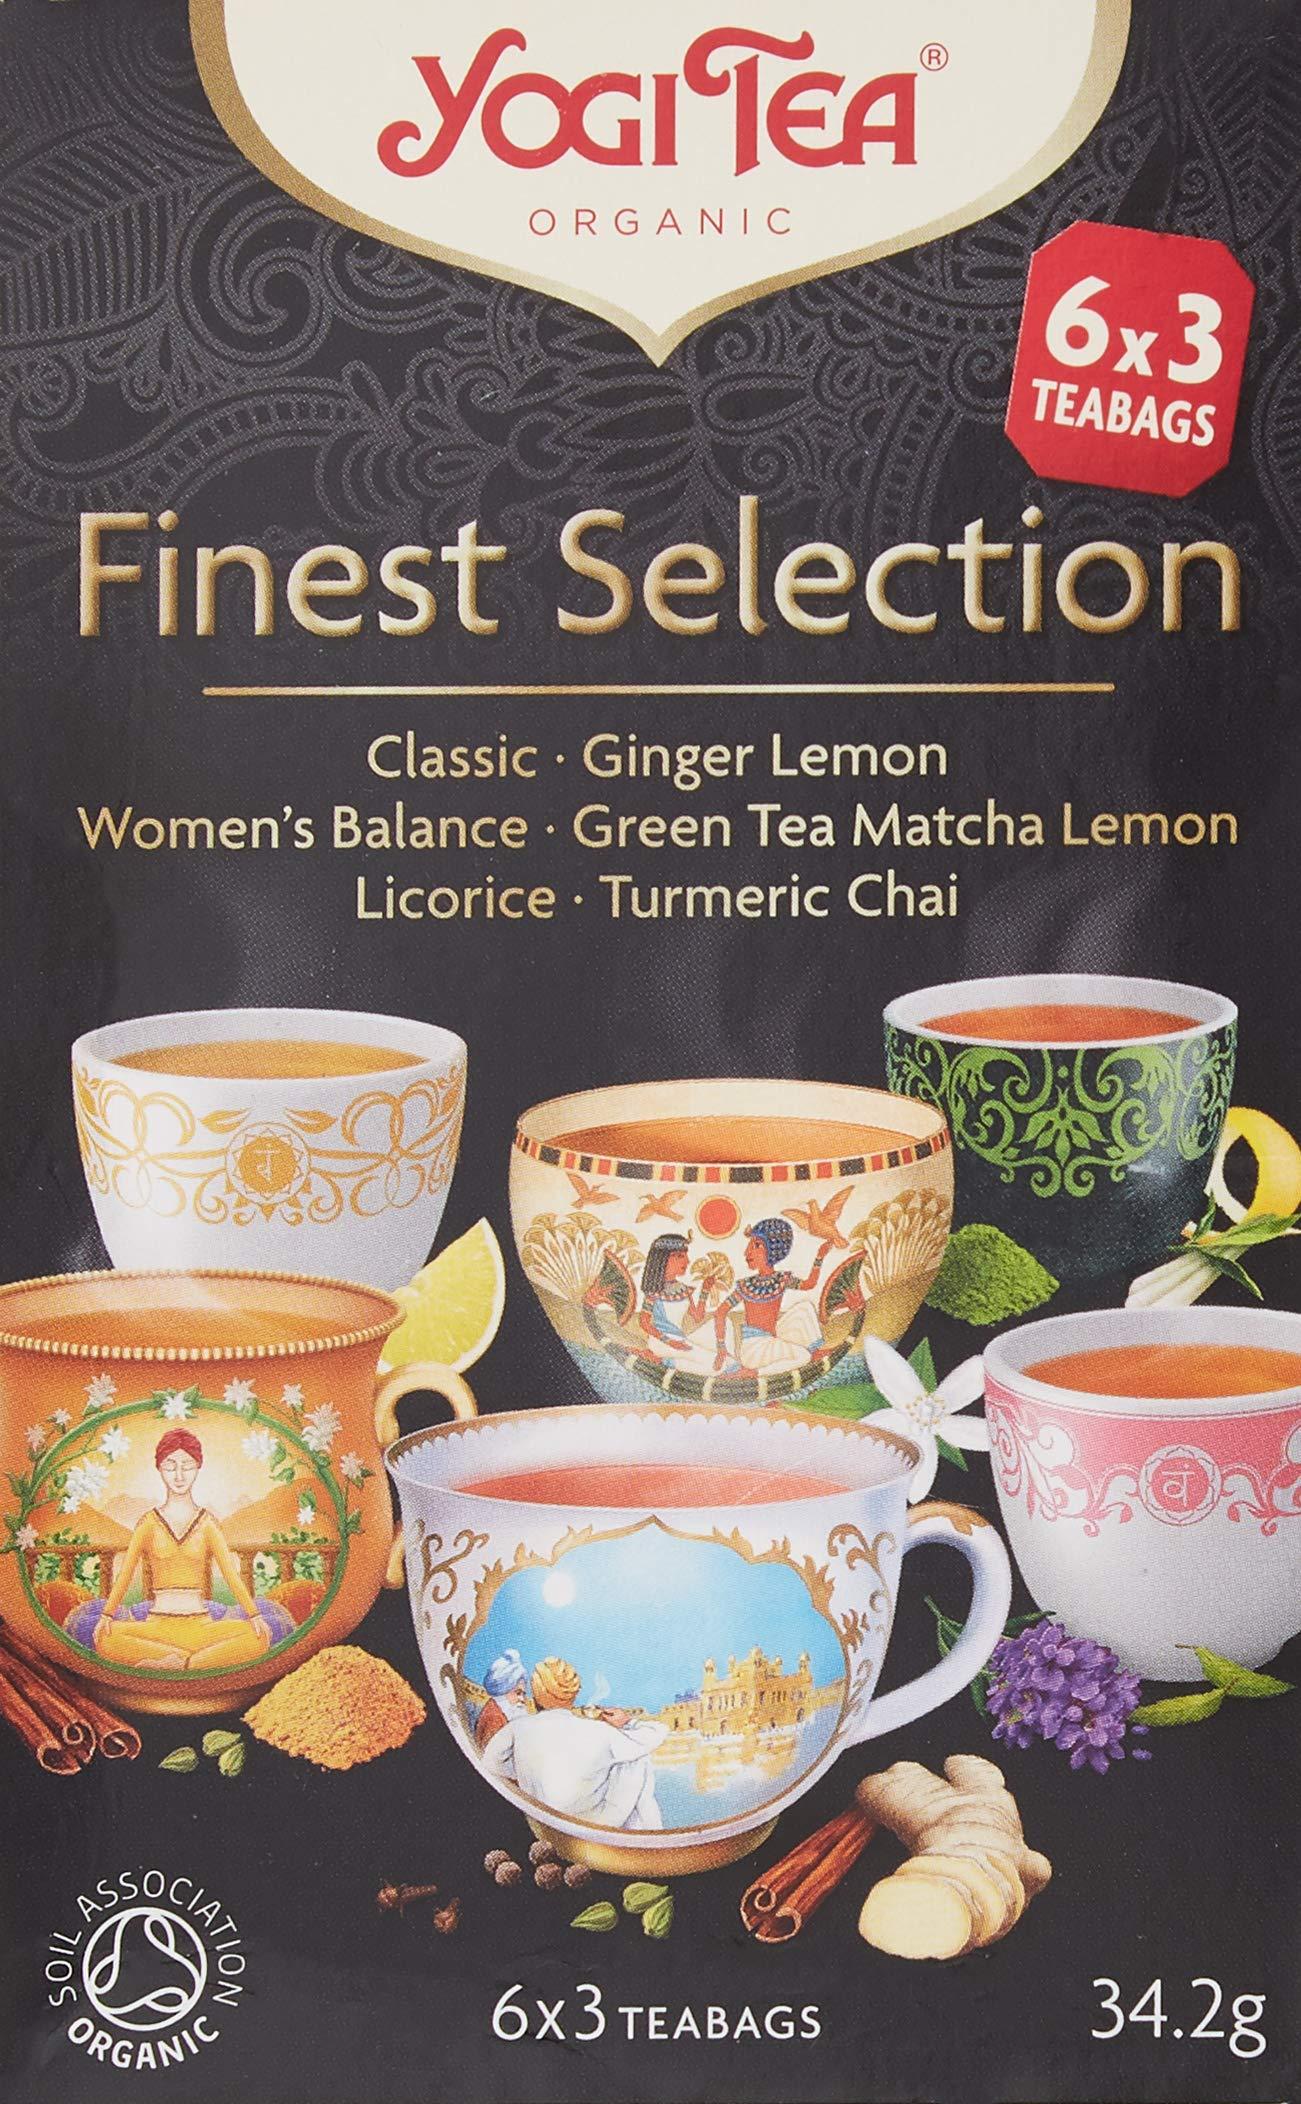 Yogi Tea Organic Finest Selection Tea 18 Teabags